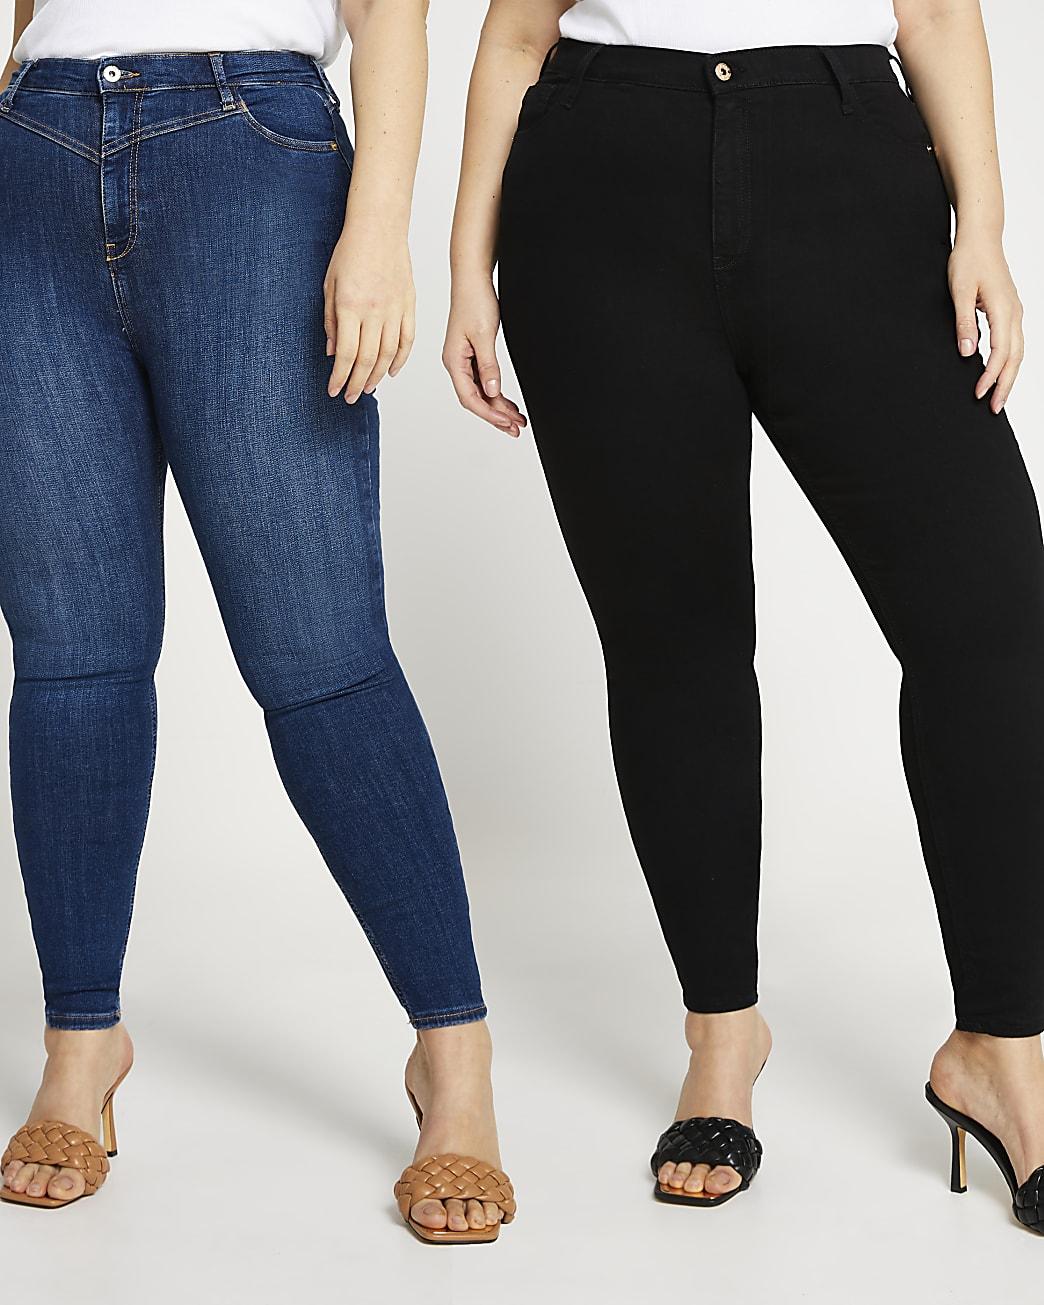 Black high waisted skinny jeans multipack